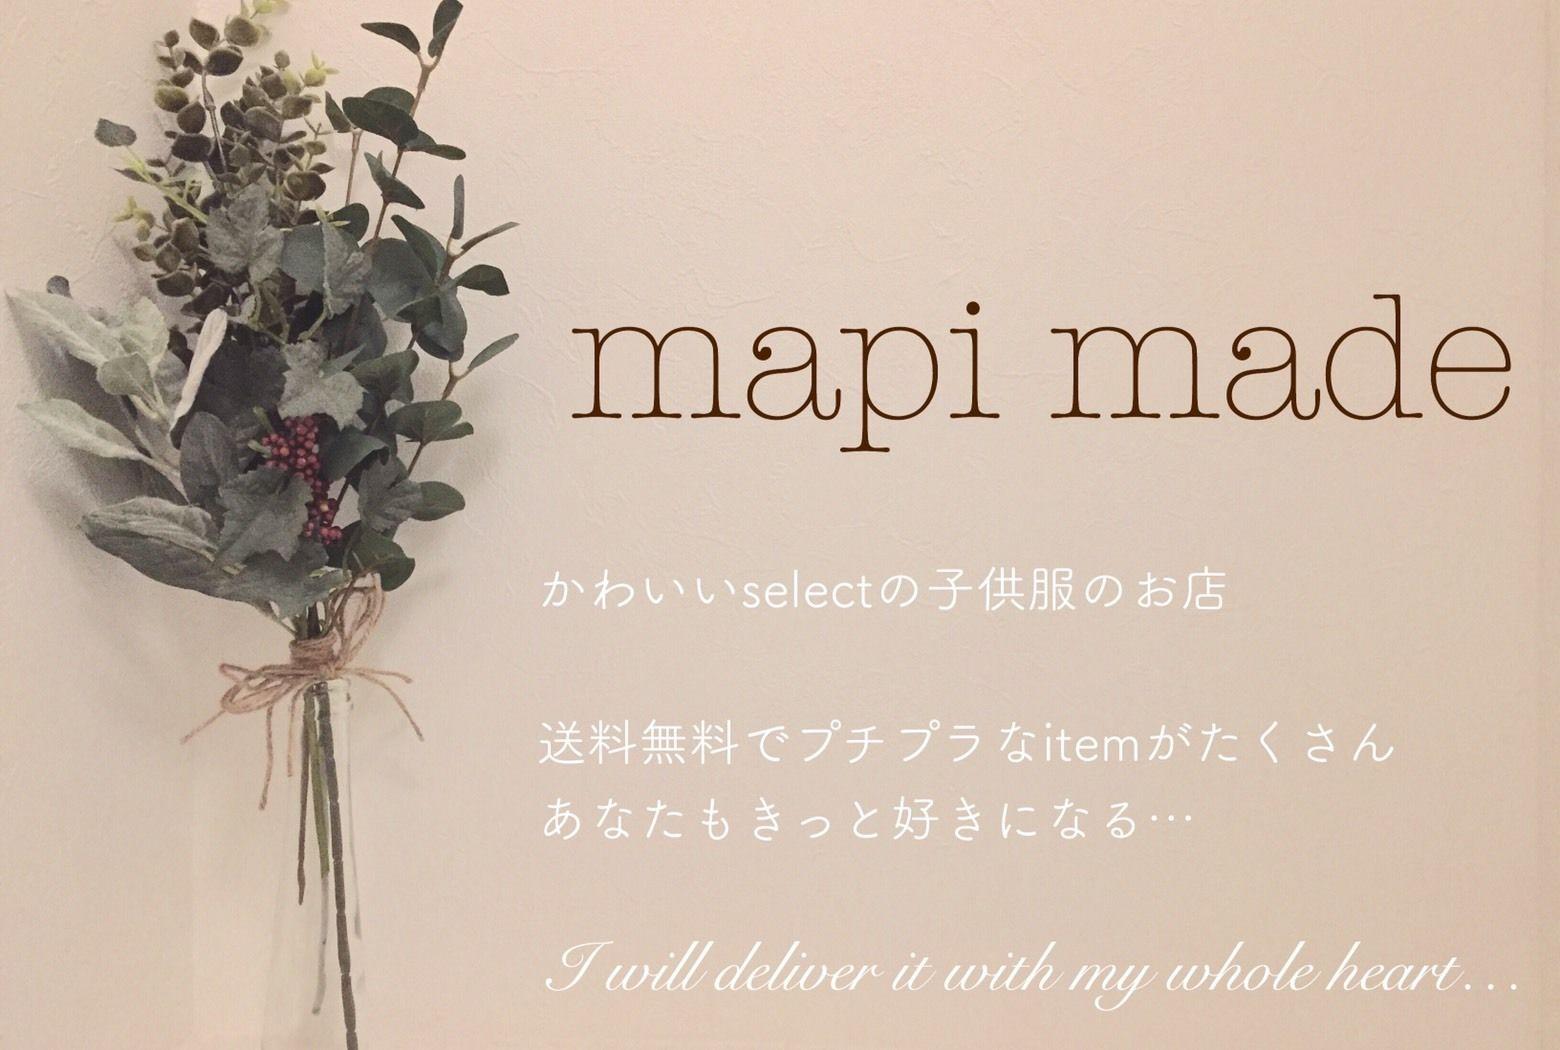 mapimade